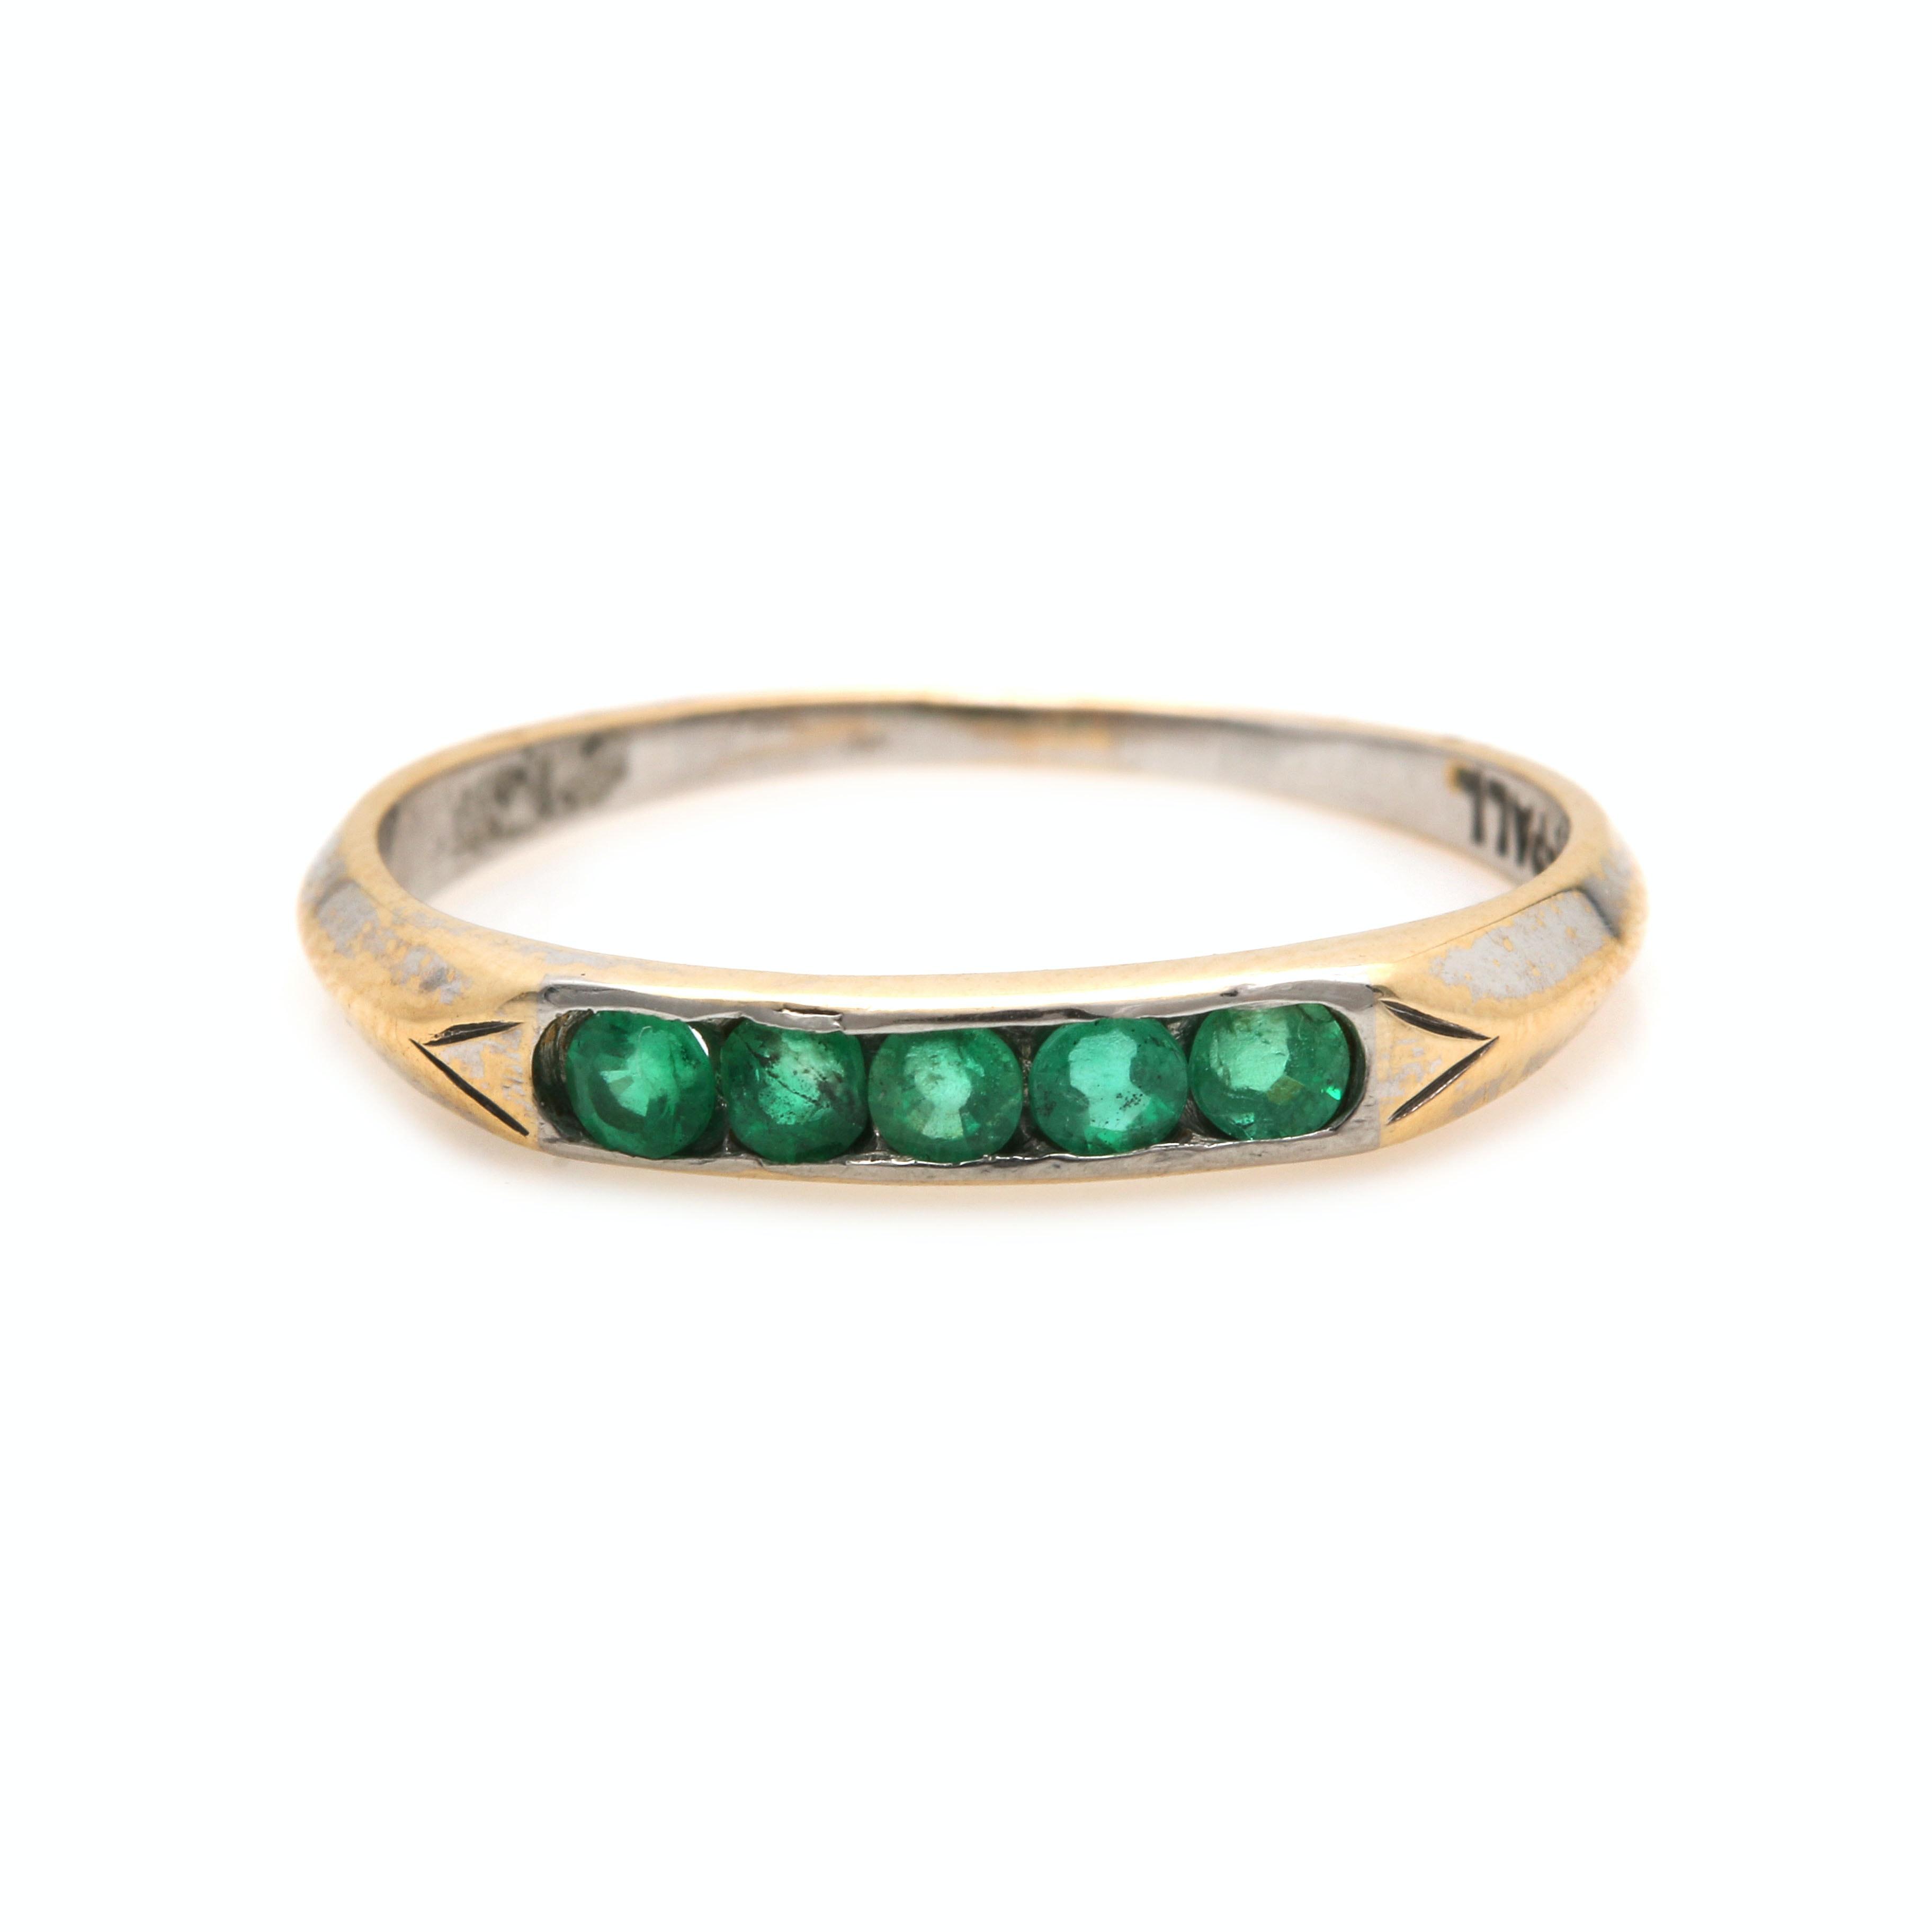 14K Yellow Gold and Palladium Emerald Ring